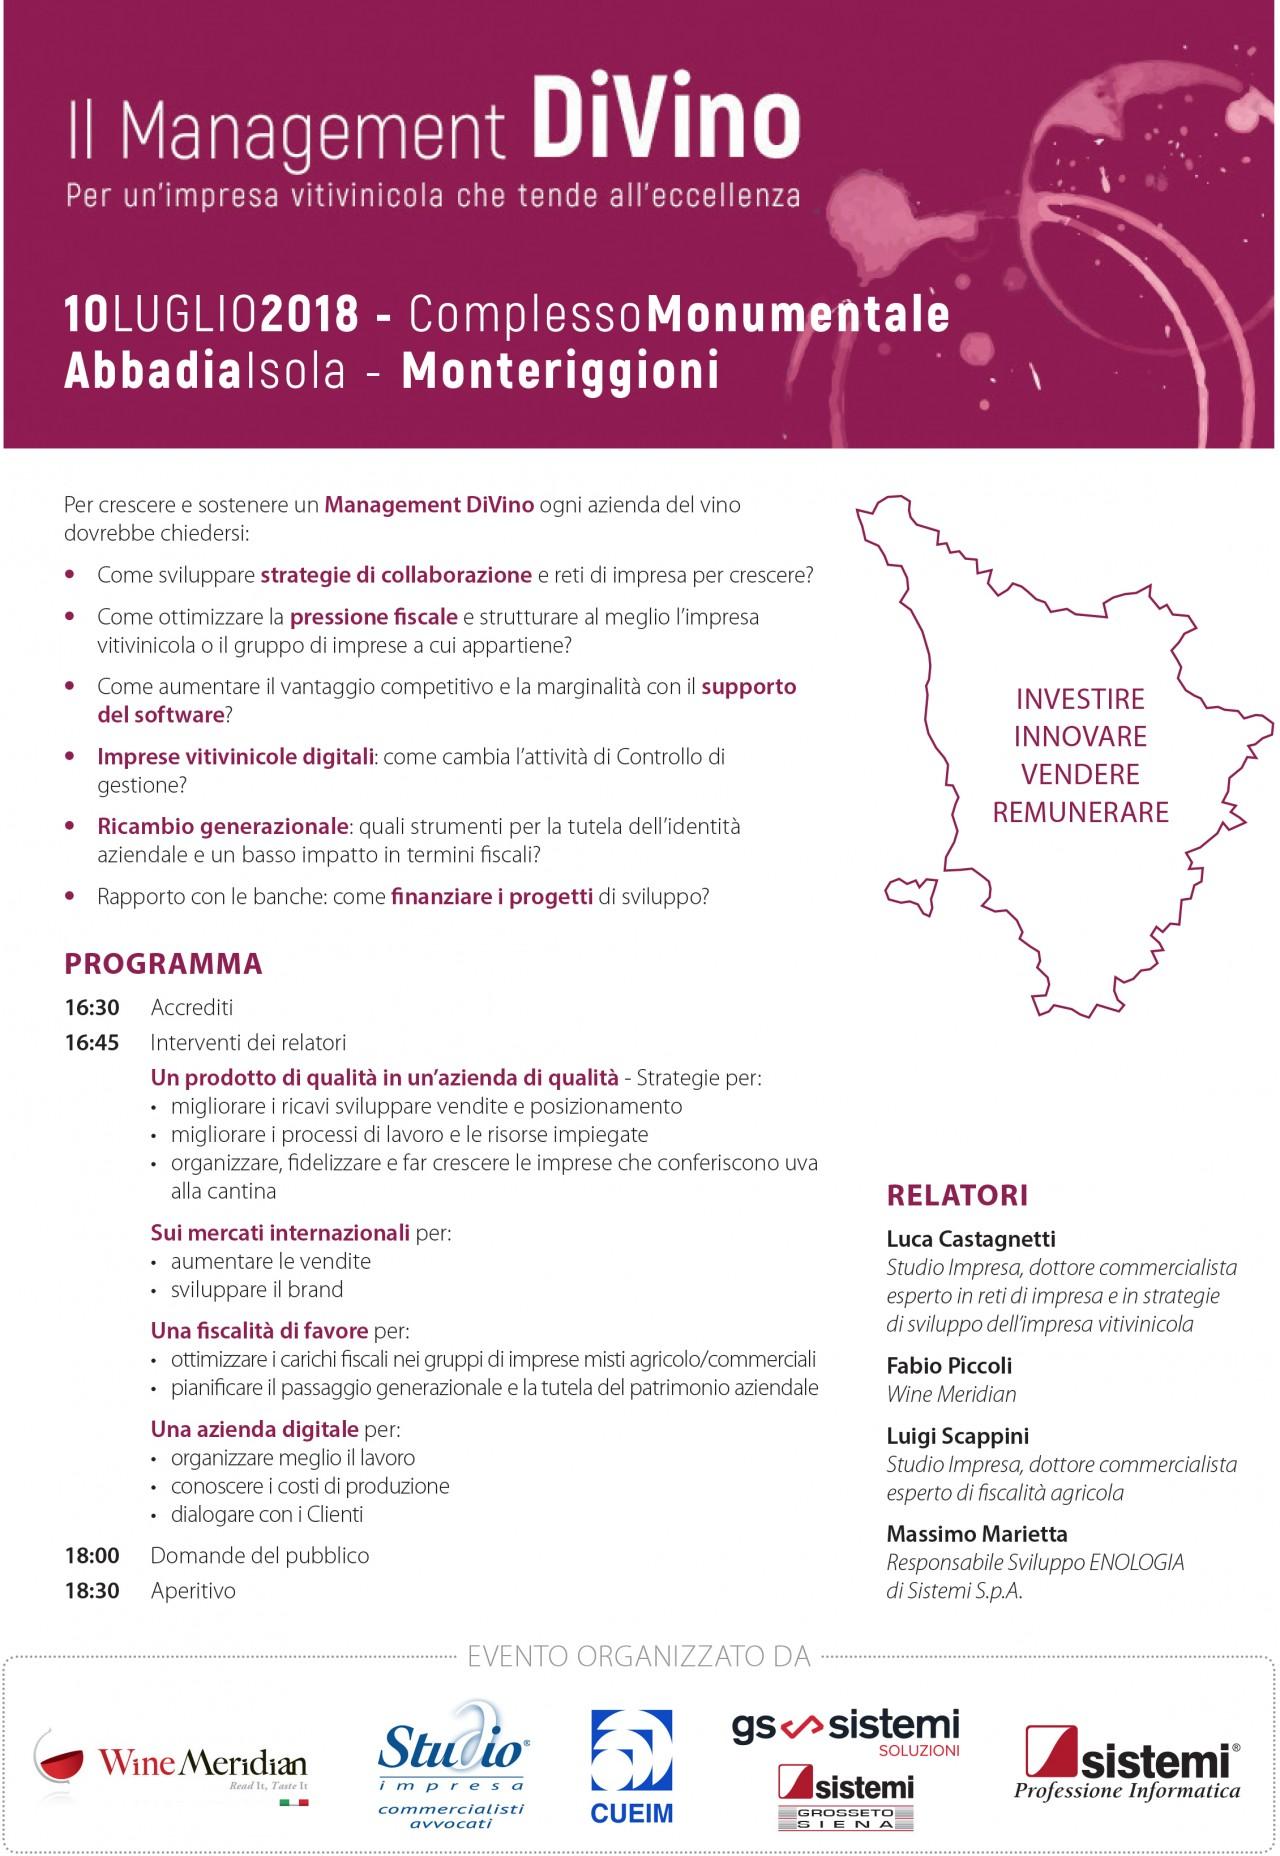 invito-management-divino-abbadia-isola-toscana.jpg